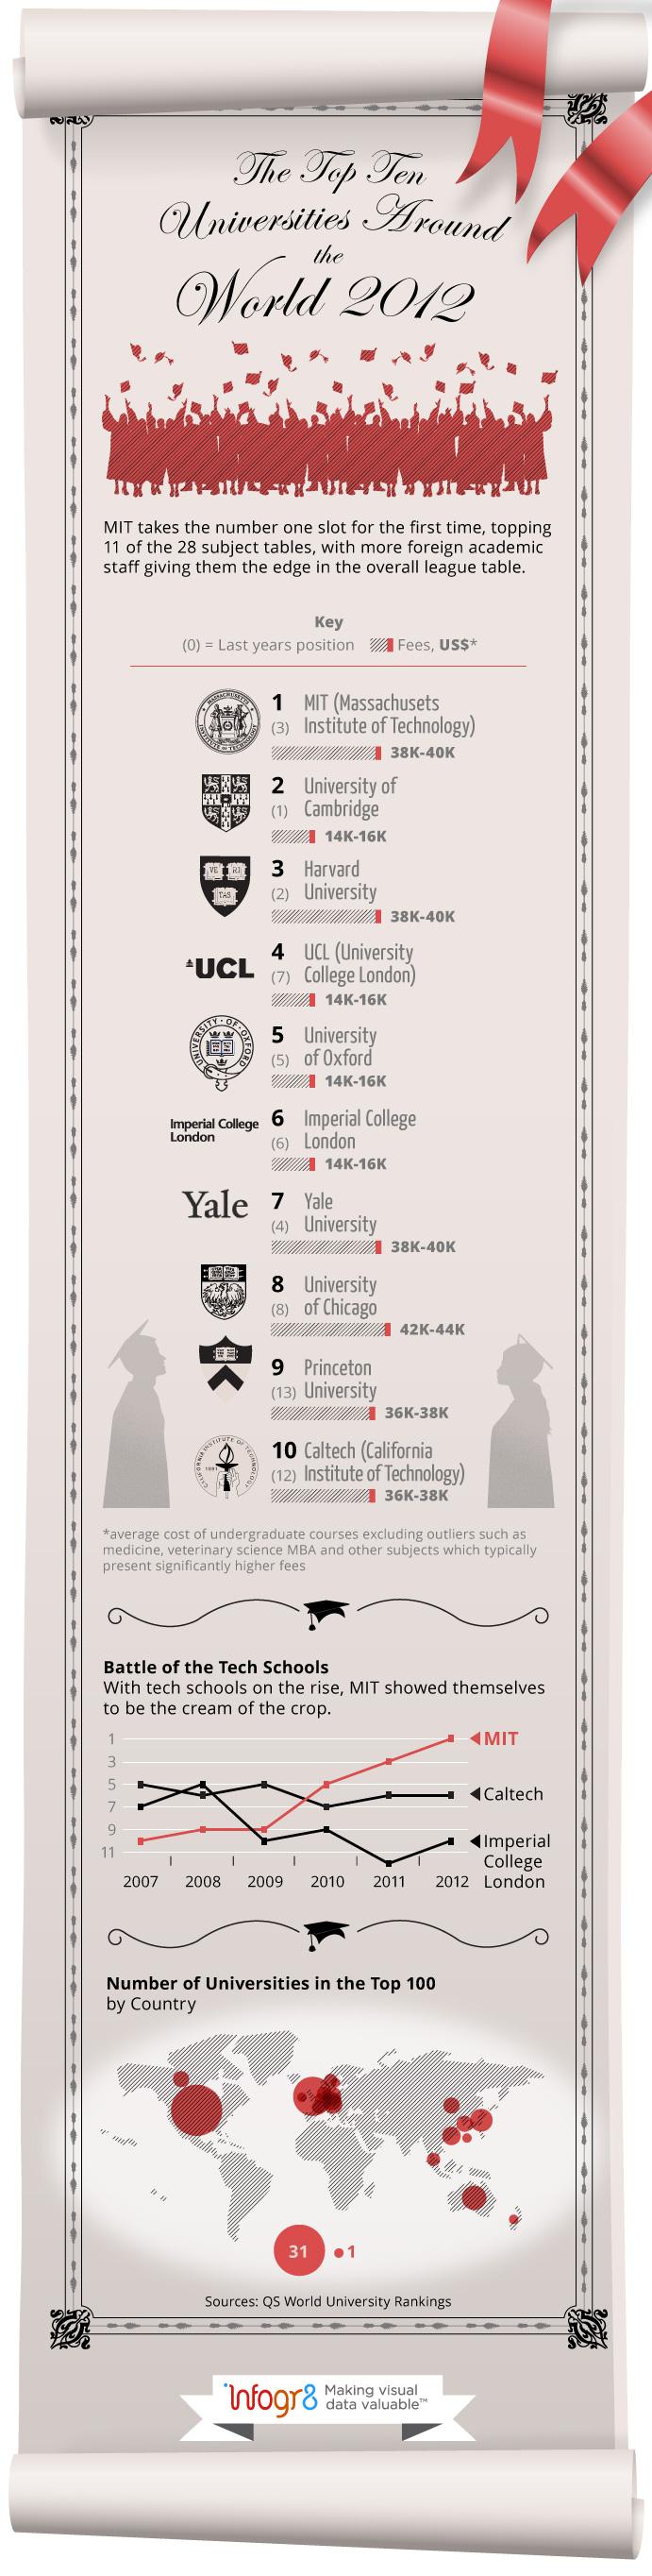 the-top-10-universities-around-the-world-2012_5053206fa47e3